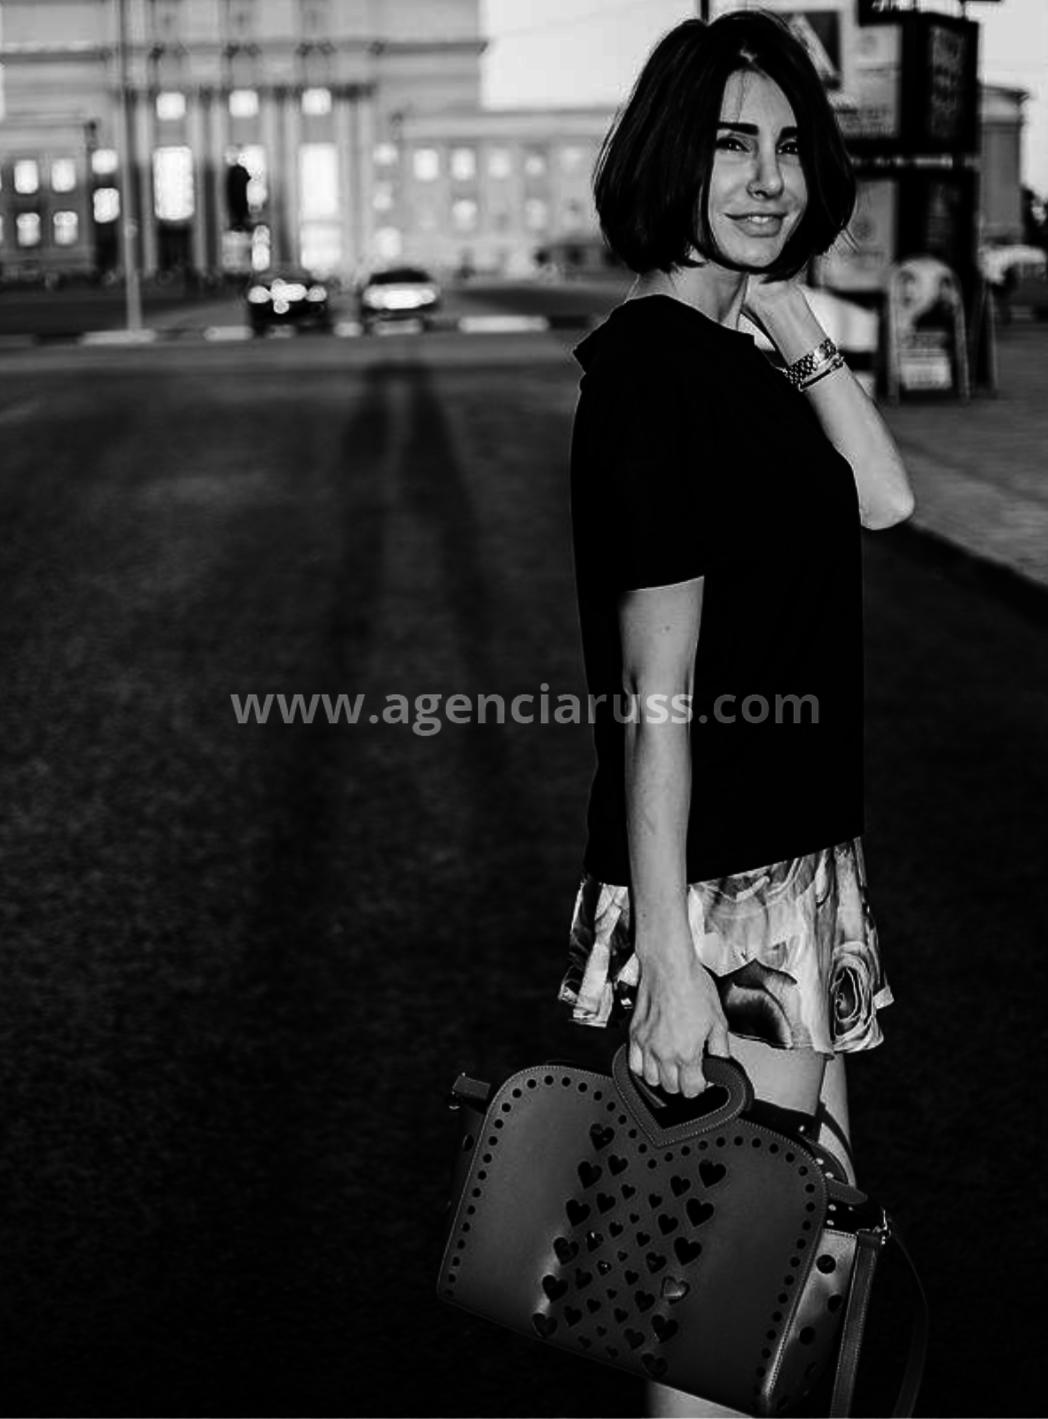 Imagechef mujeres solteras sheyla